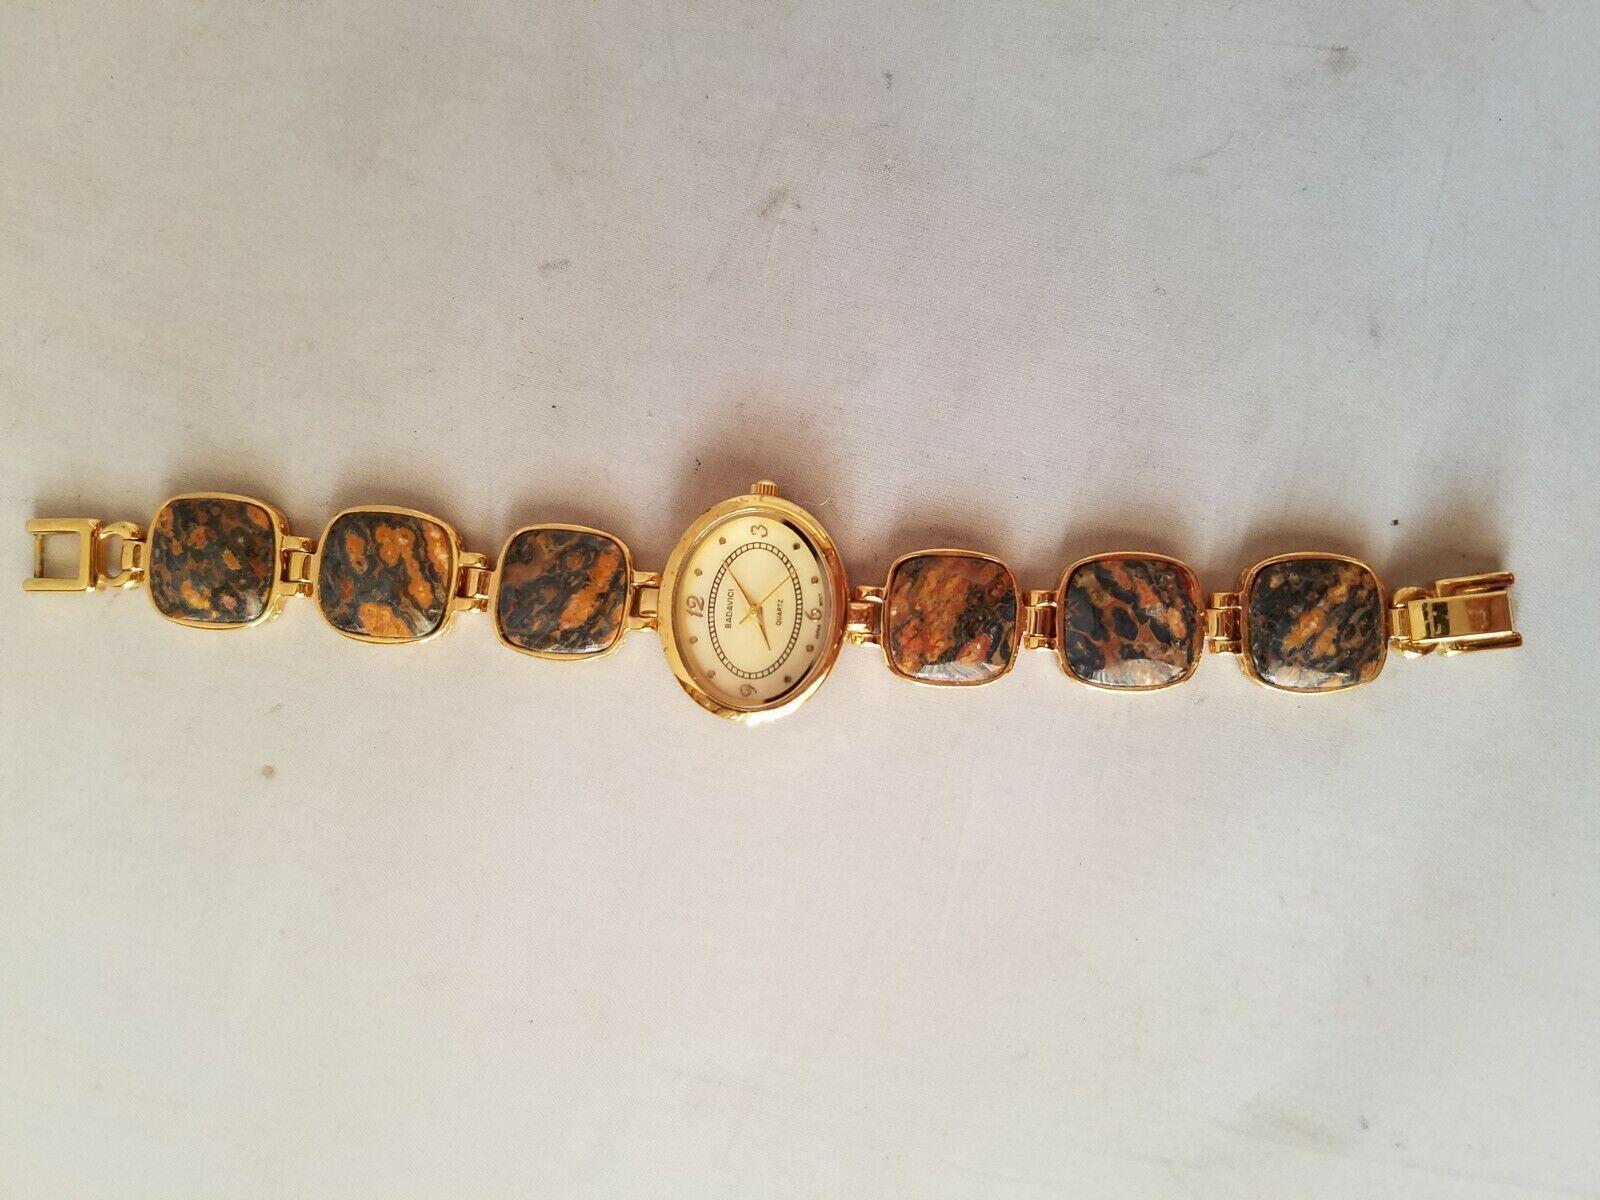 Badavici Vintage Women's Wrist Watch Semi Precious Stones Gold Tone Oval Quartz